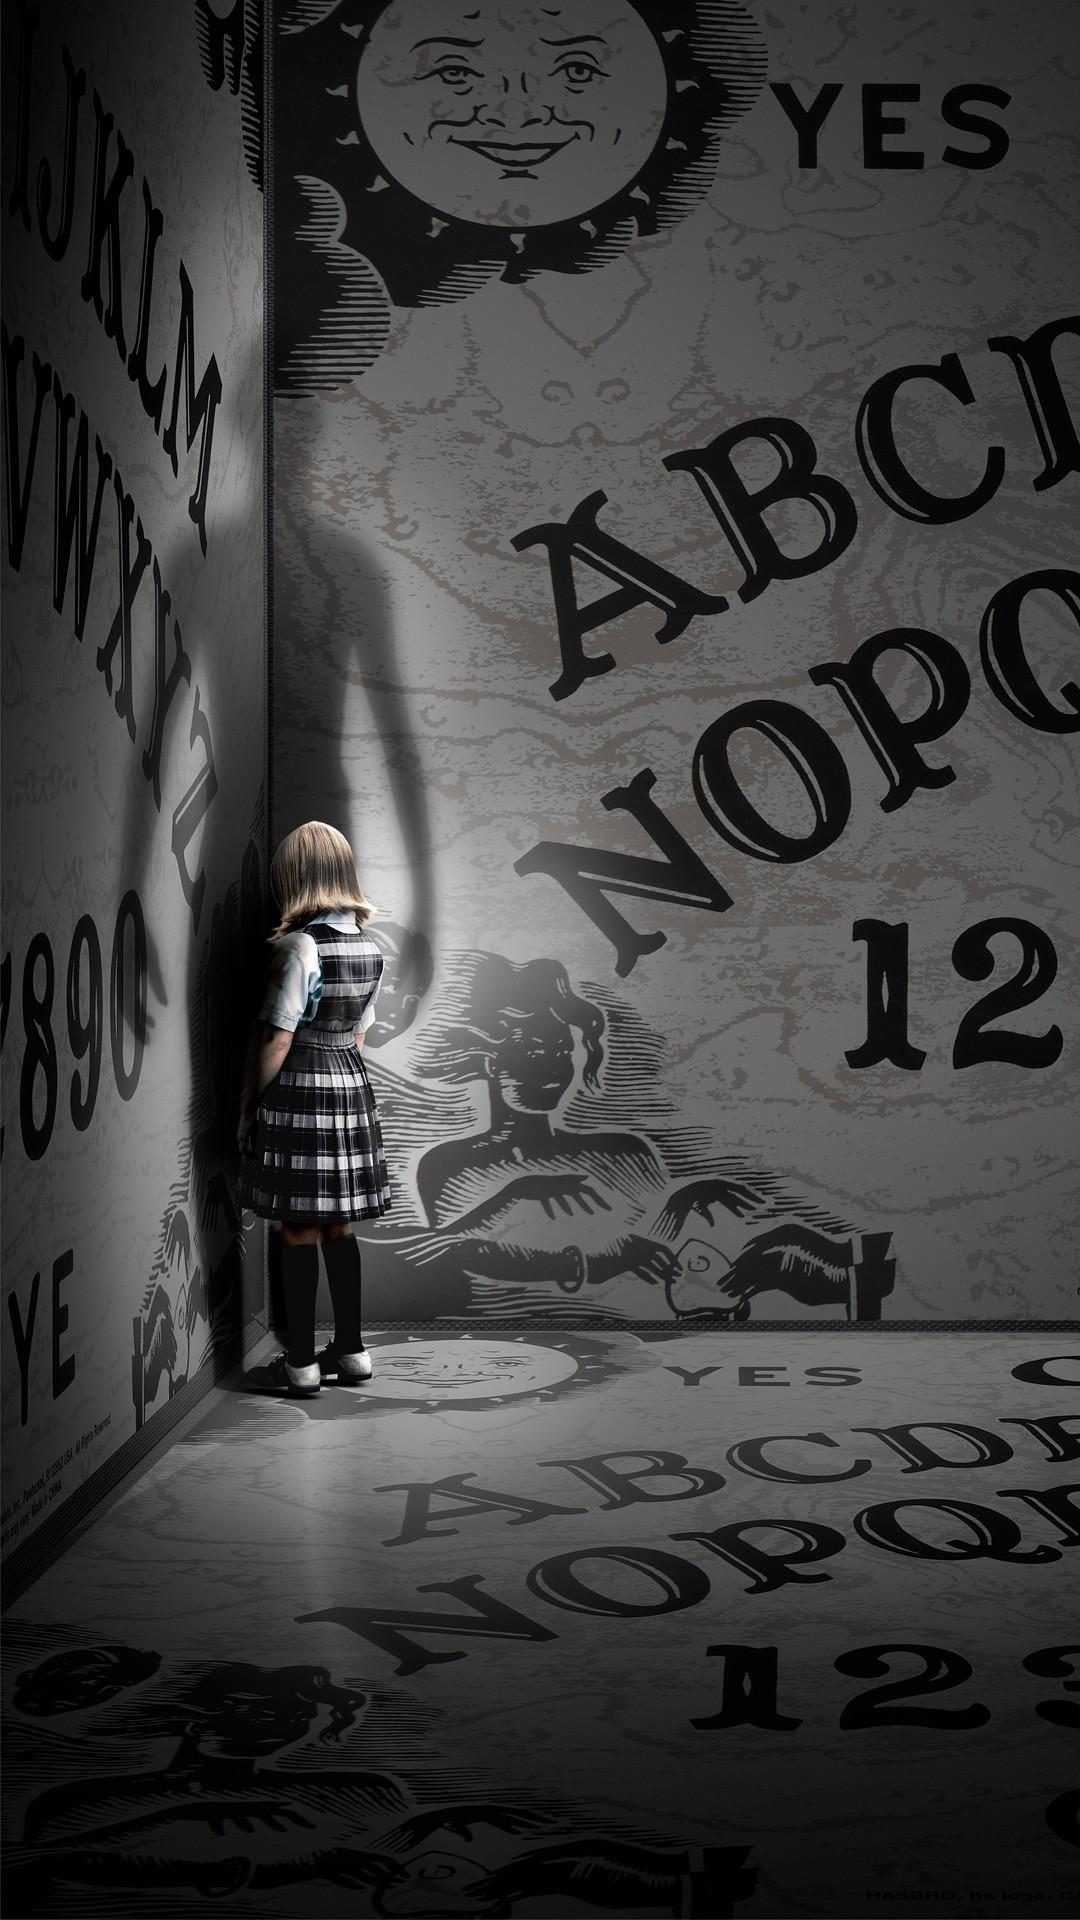 Hd Wallpapers Butterflies Widescreen Ouija Origin Of Evil 4k Wallpapers Hd Wallpapers Id 18973